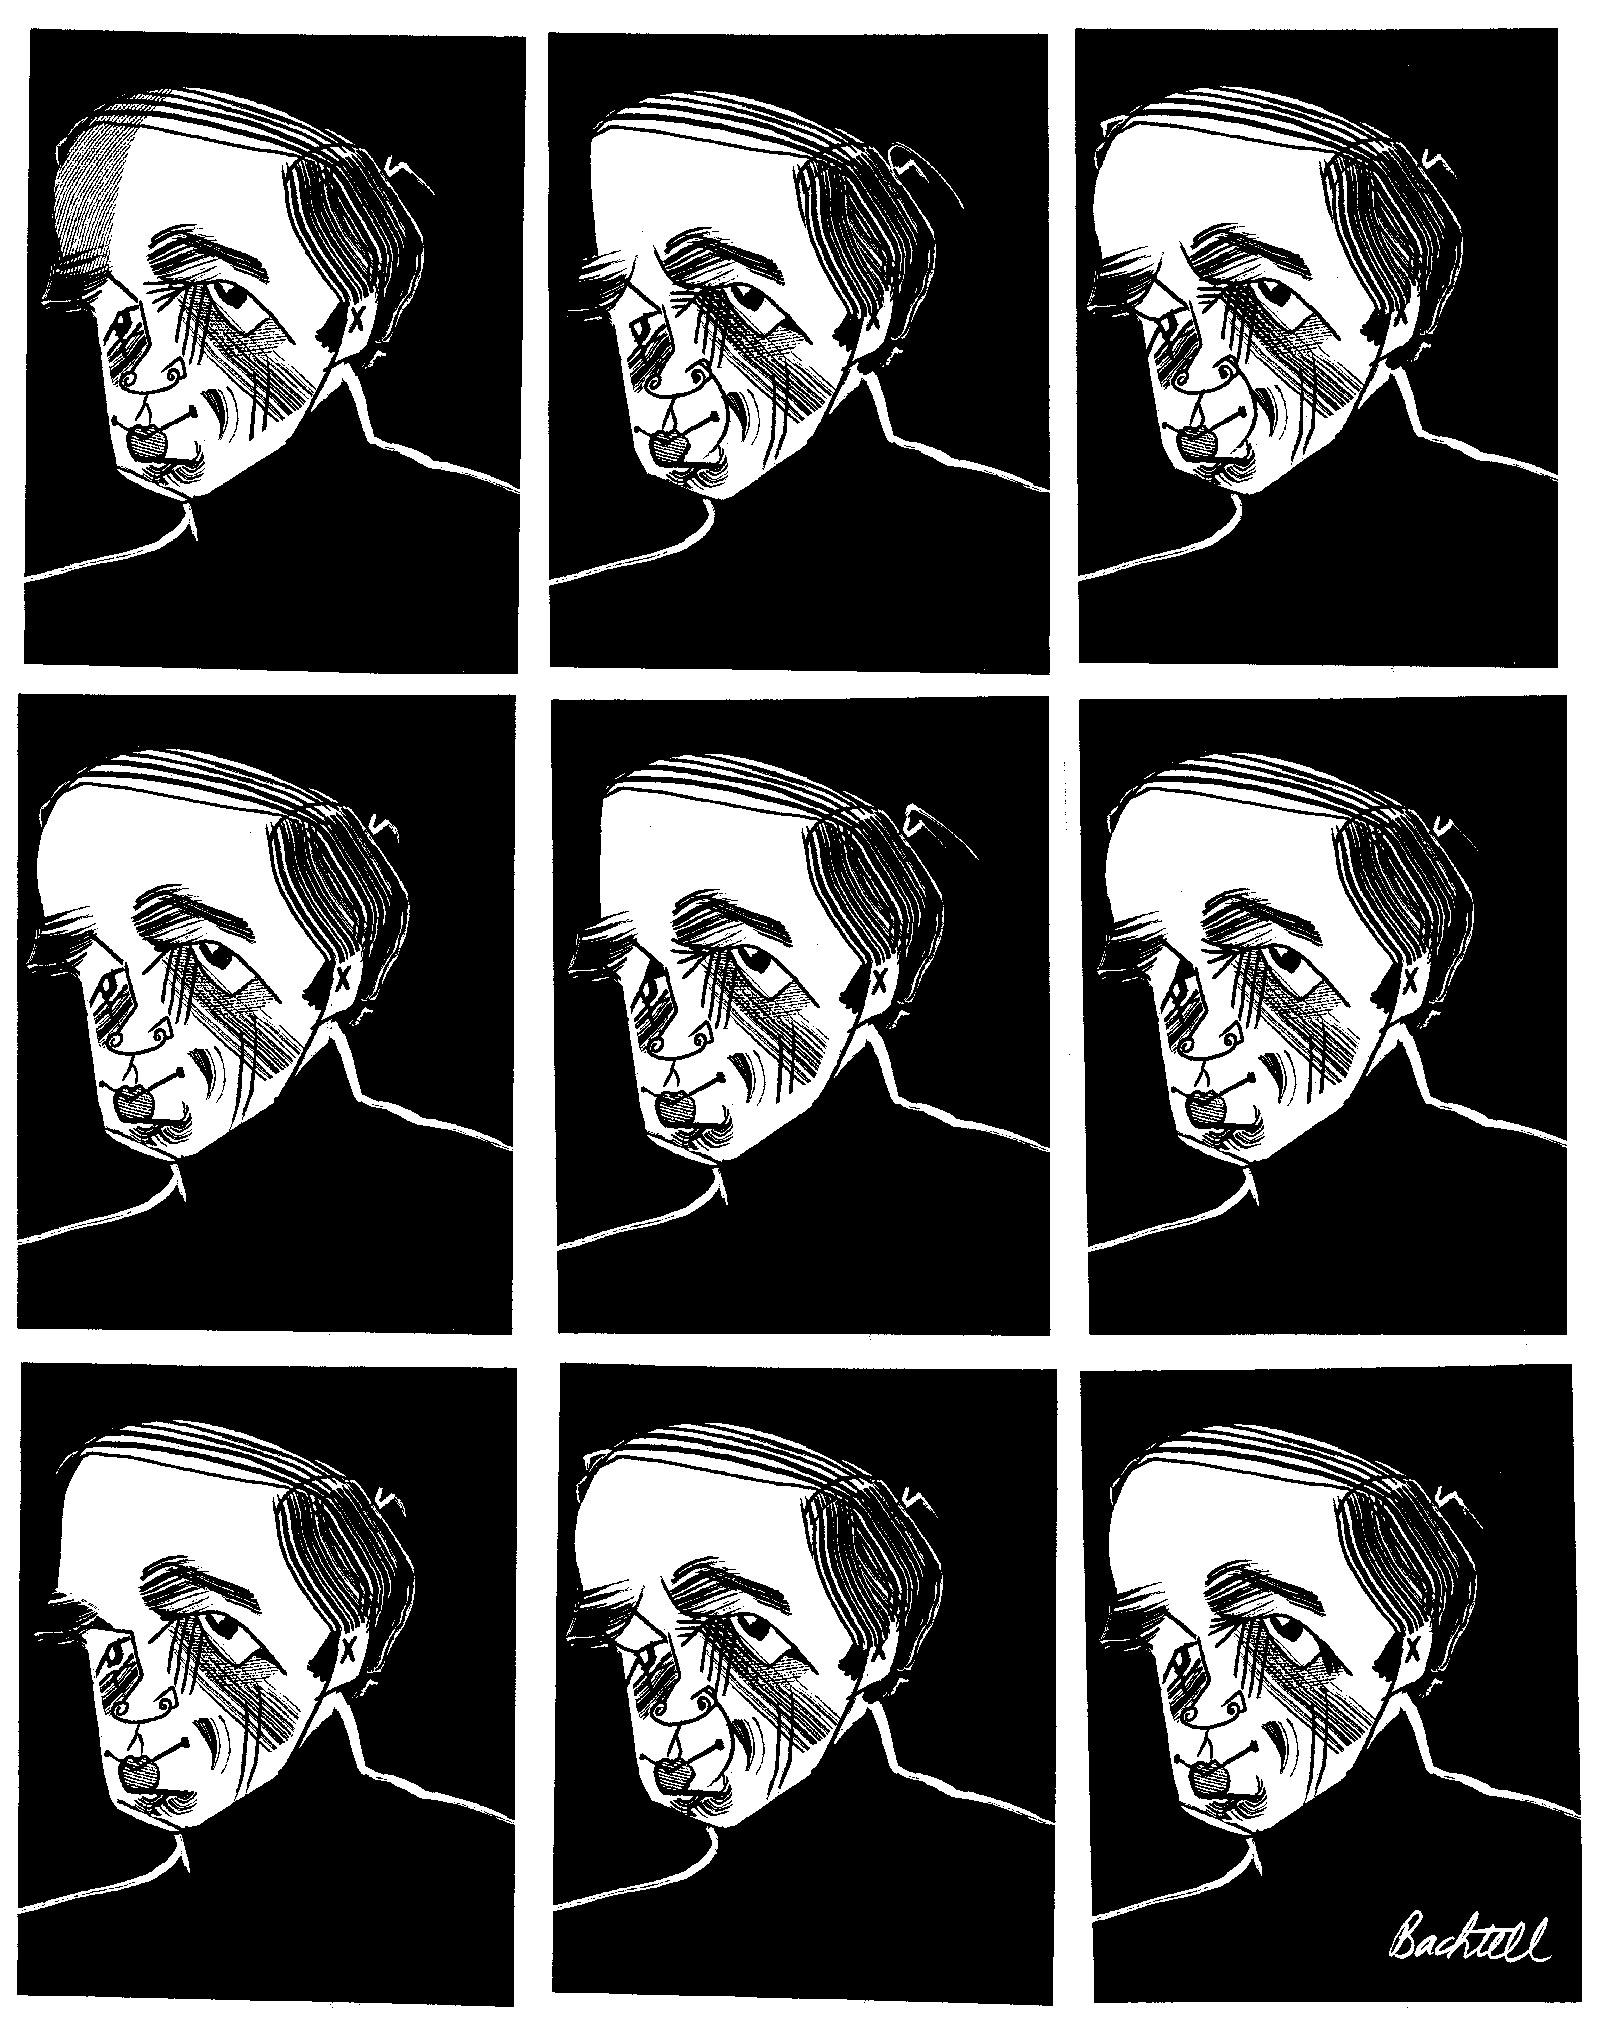 Pierre Boulez; illustration by Tom Bachtell